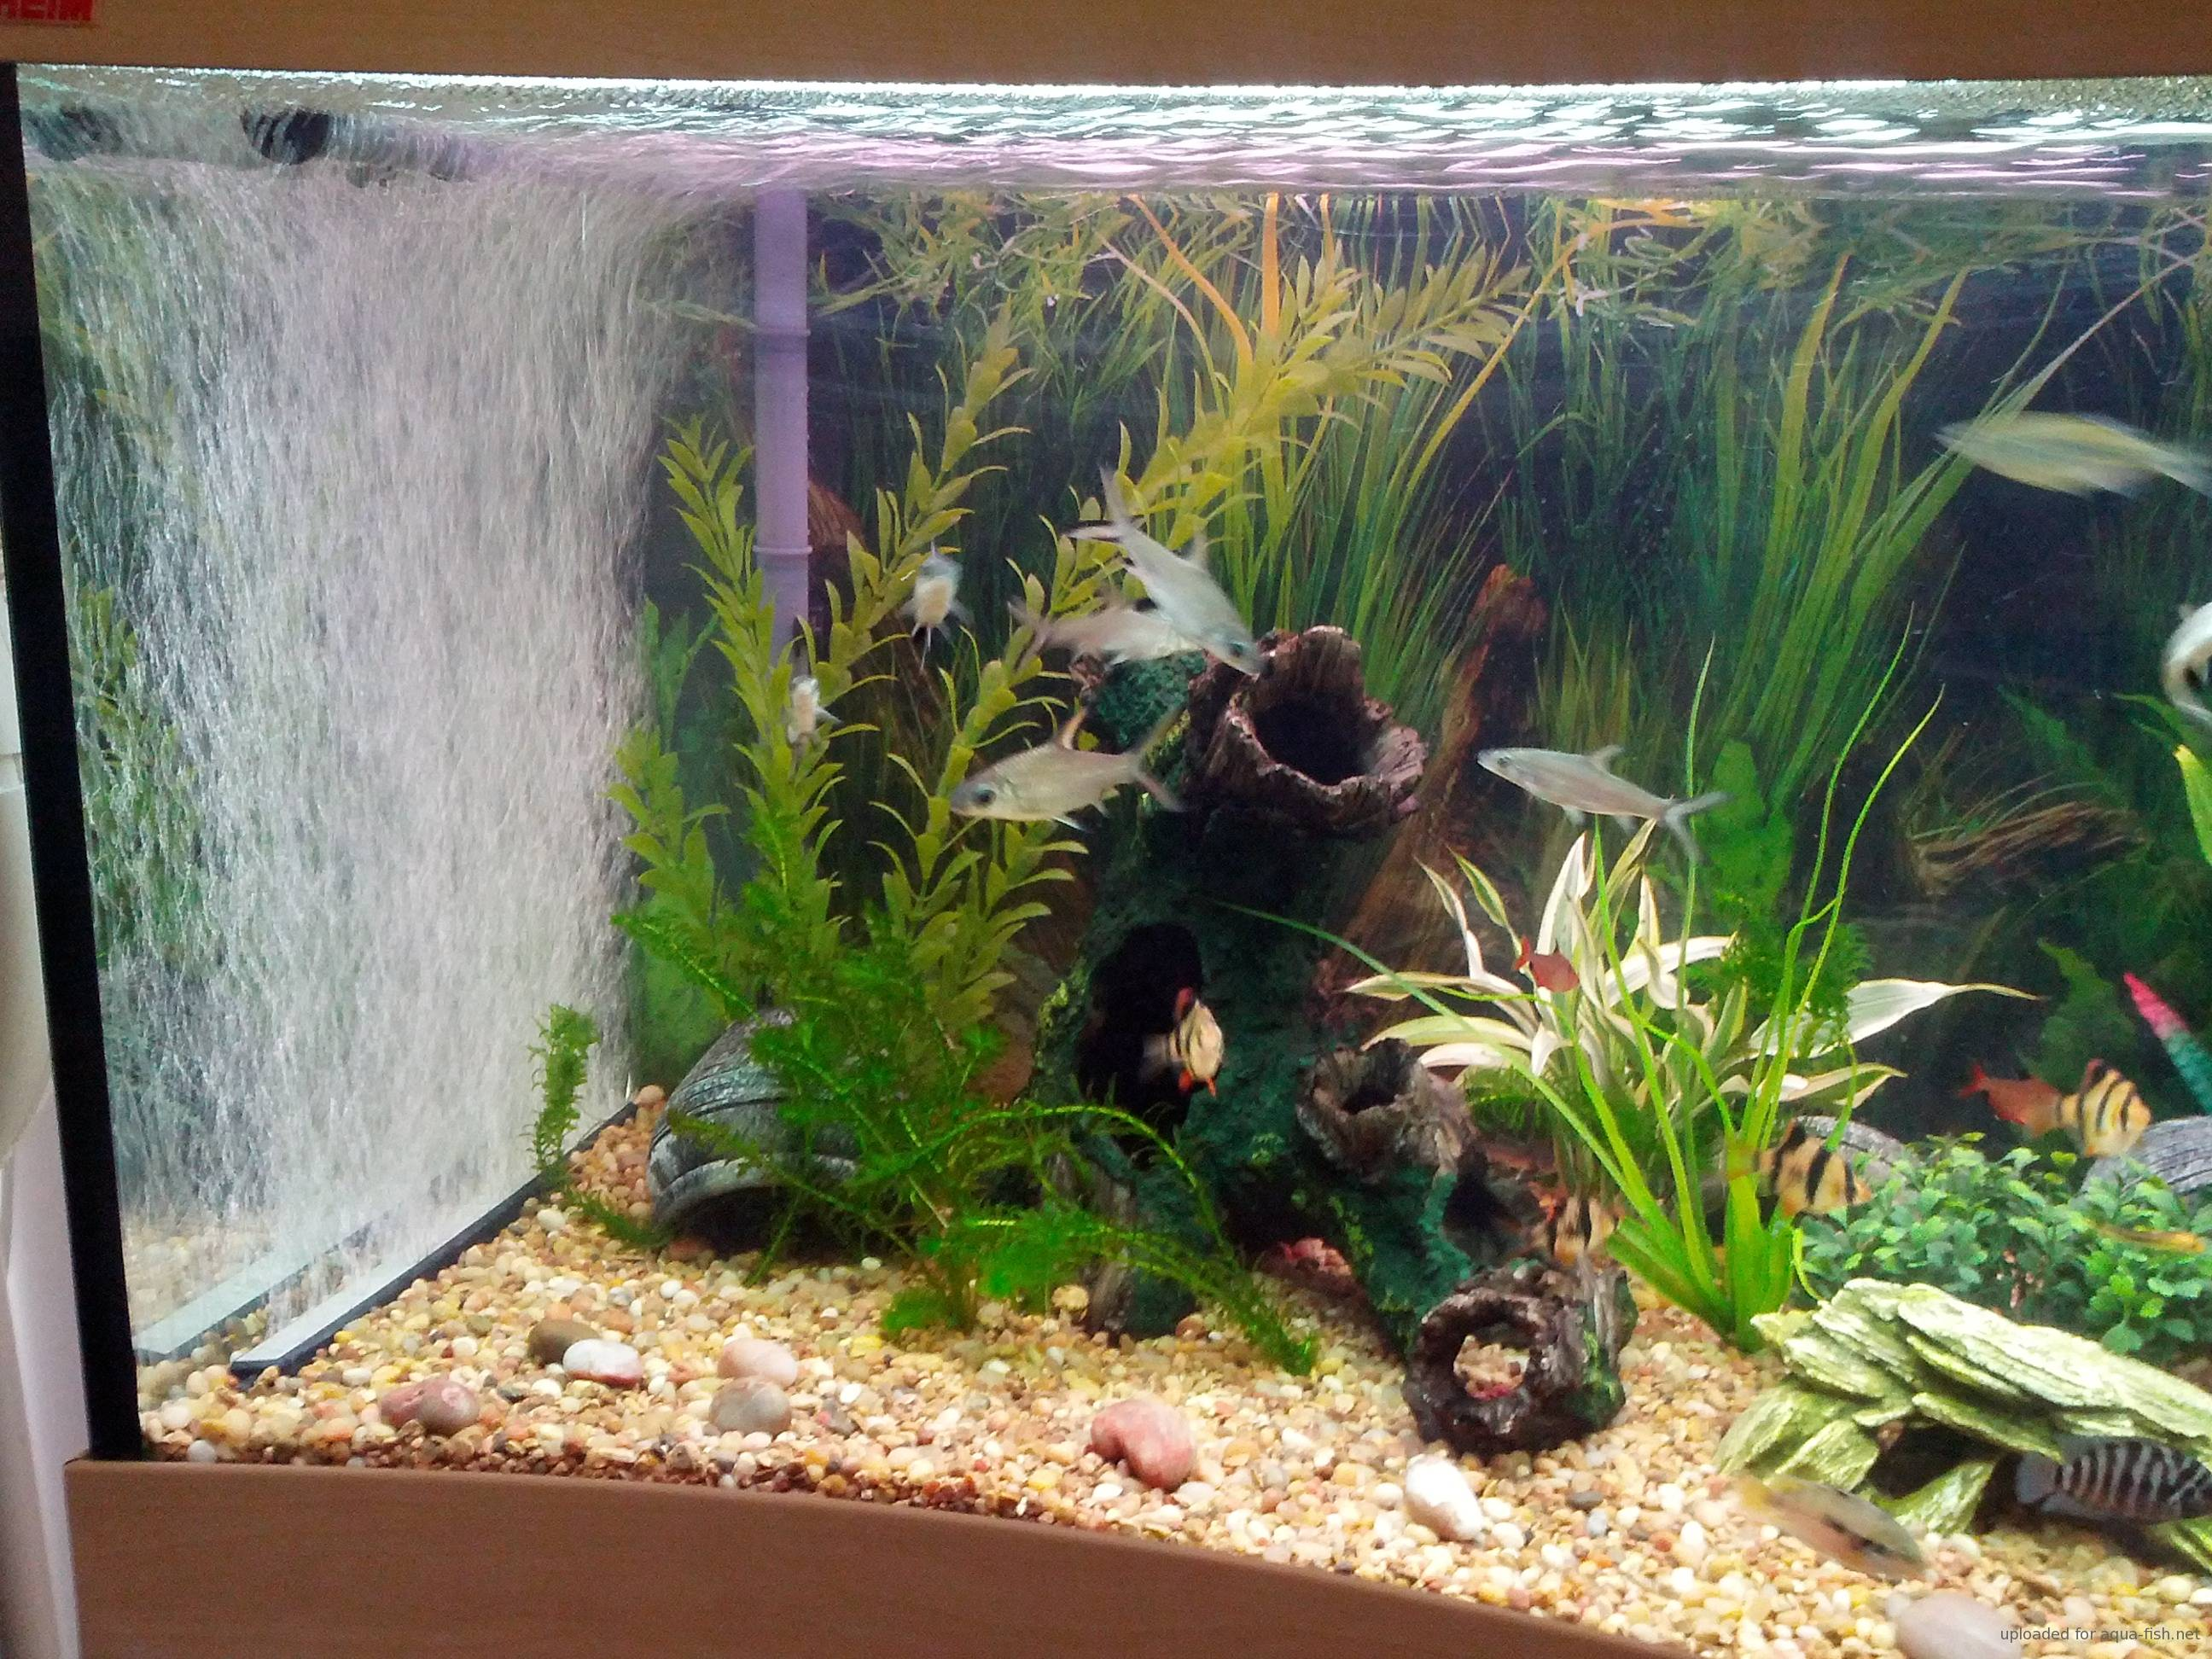 Viewtopic additionally 14241 Oscar Fish Cichlid Woes together with Tiger oscar 28 additionally Tiger Oscar Tank as well Viewtopic. on oscar cichlid forum